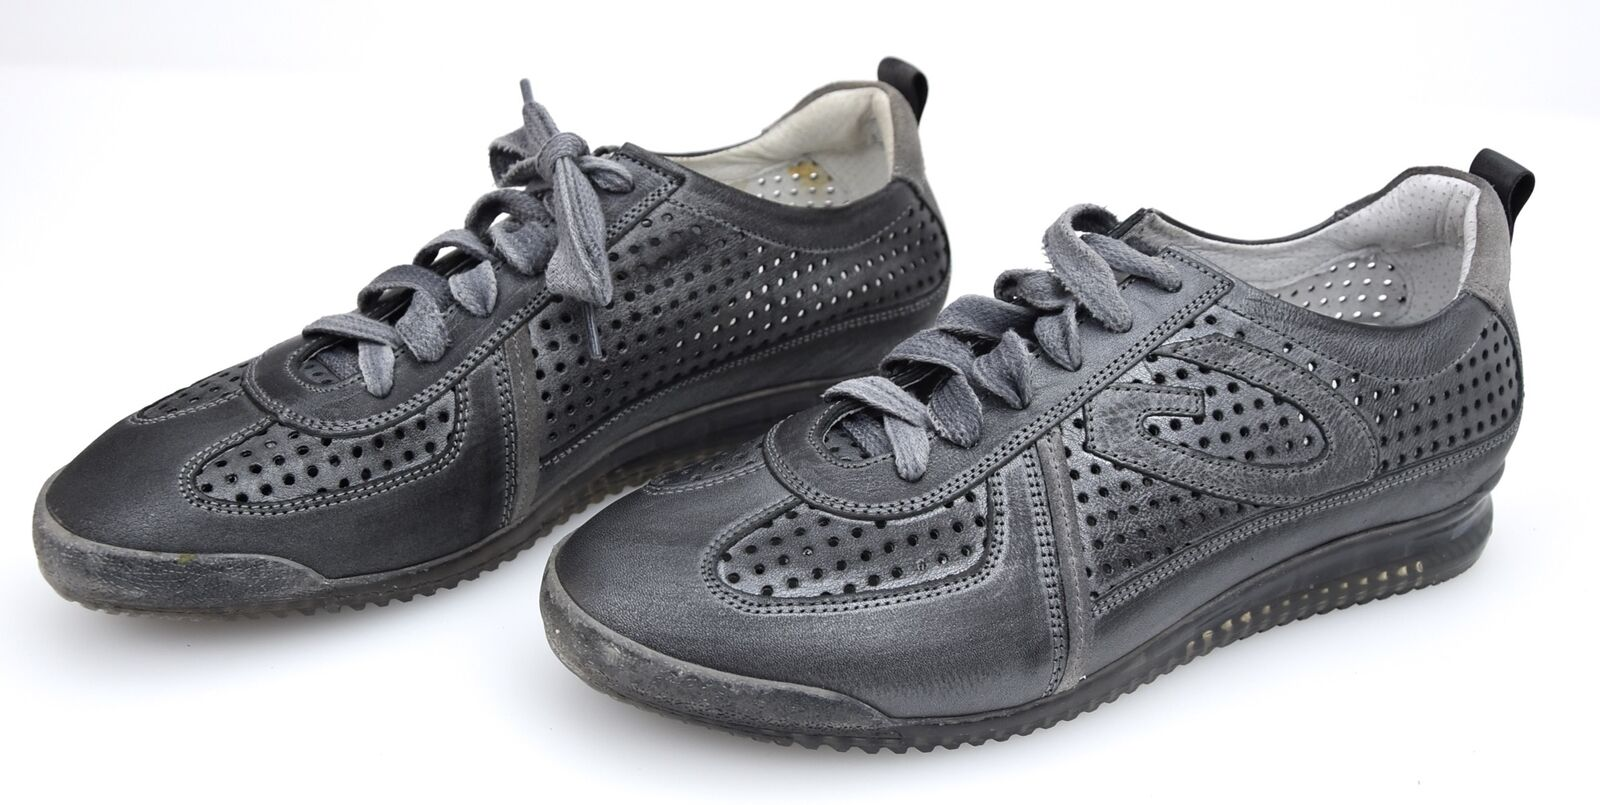 Alberto Guardiani Hommes Baskets Chaussures De Loisirs baskets Cuir su68324l